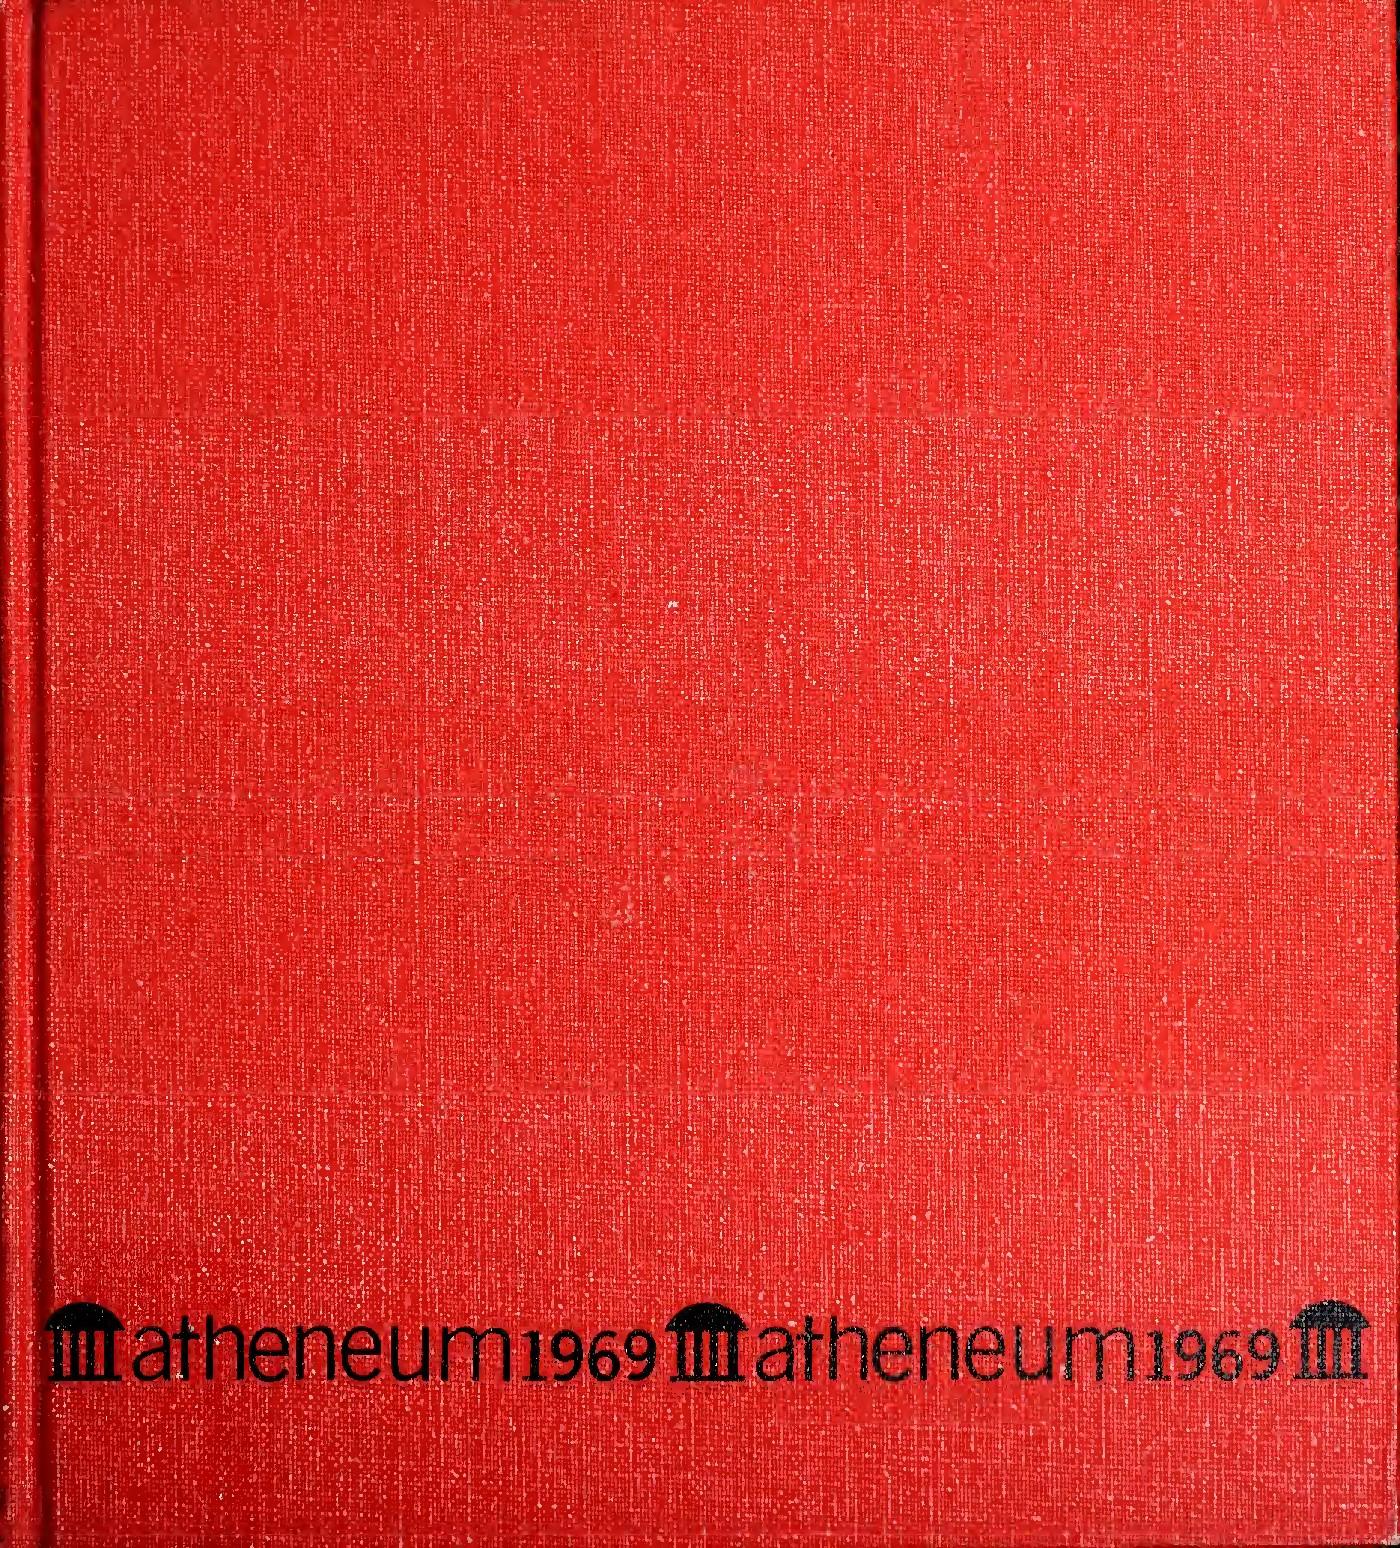 Atheneum, 1969